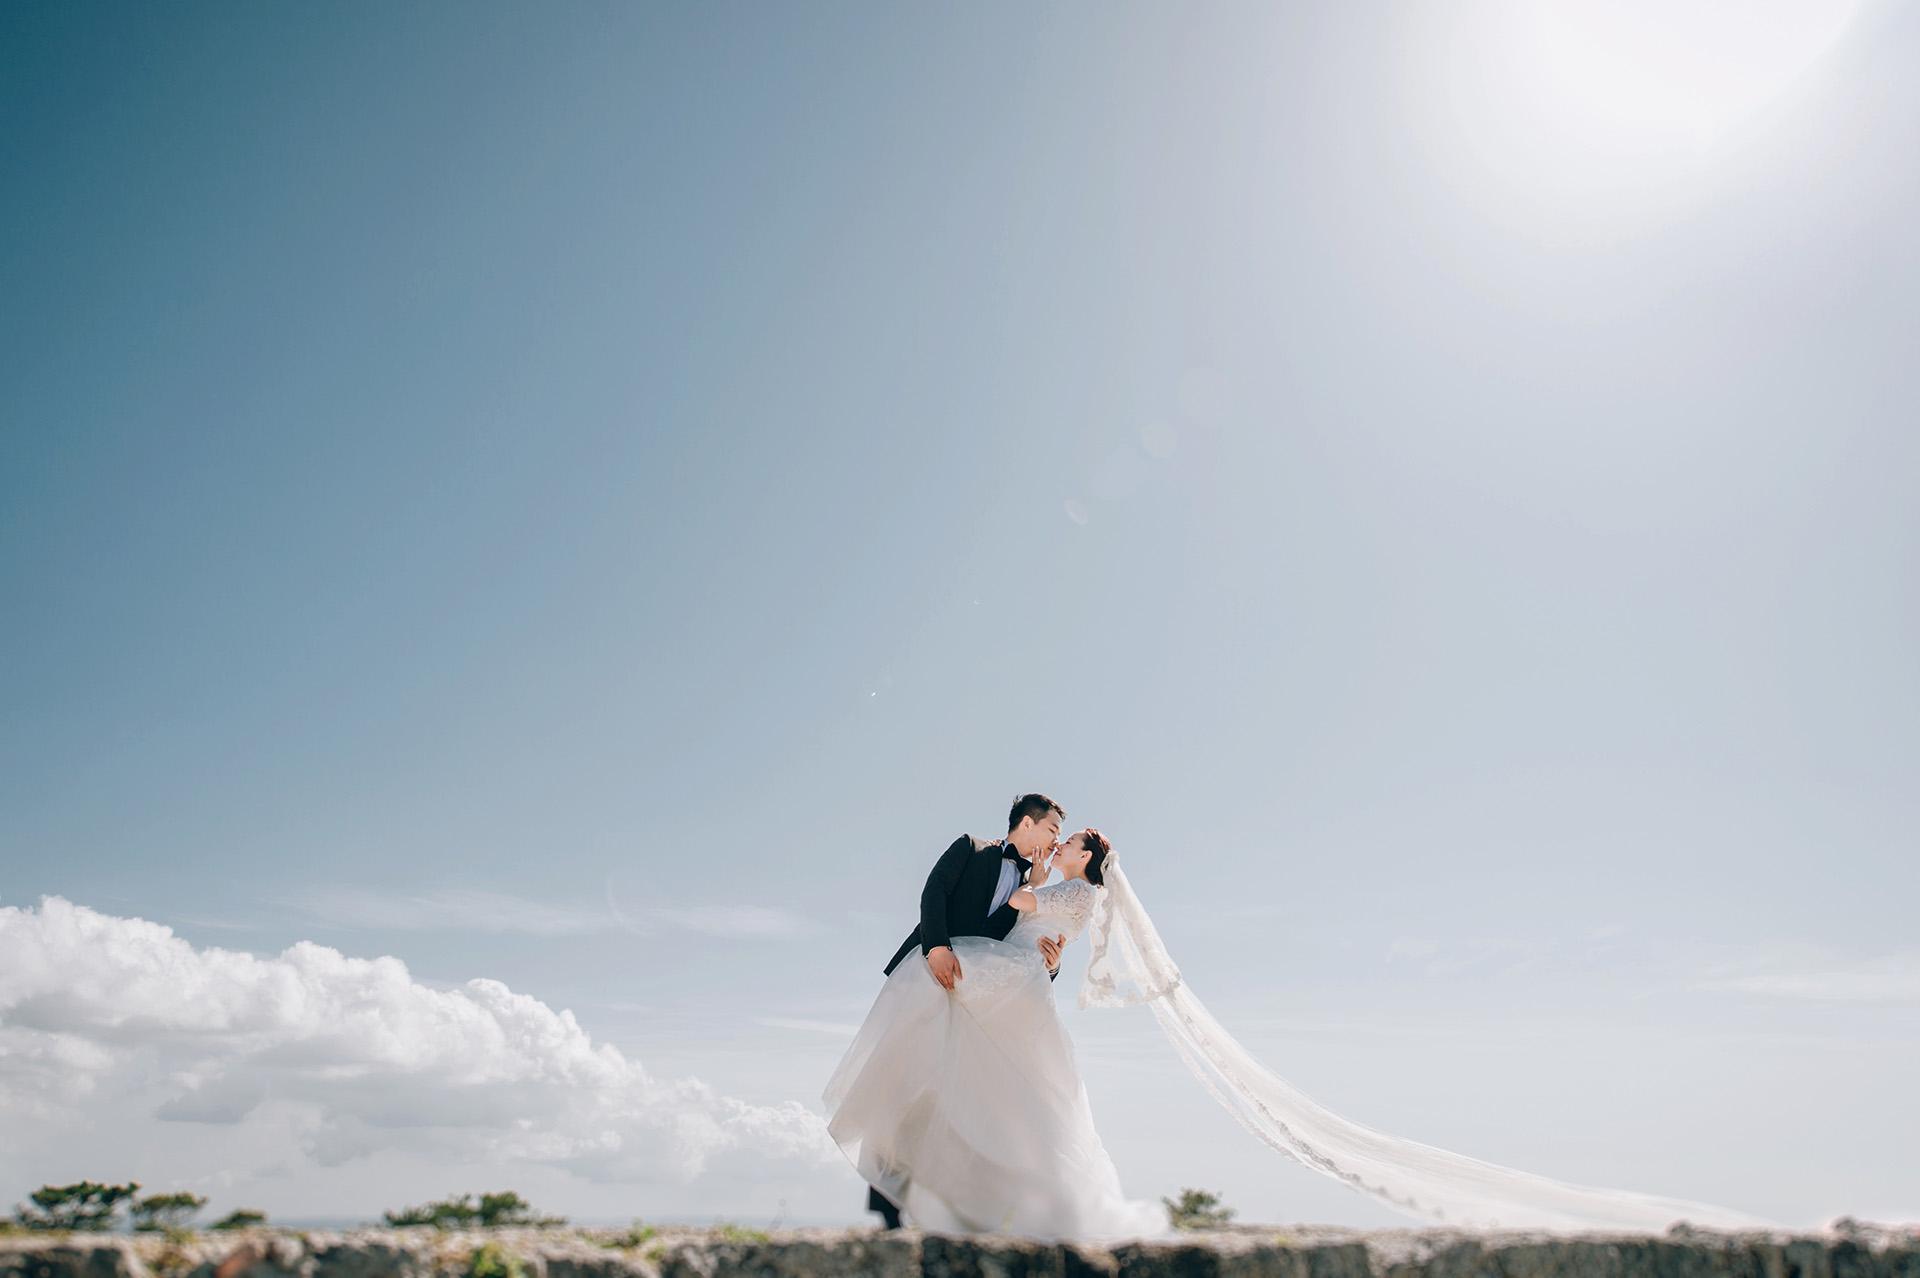 《海外婚紗》Jason & Alice / 日本沖繩 Okinawa